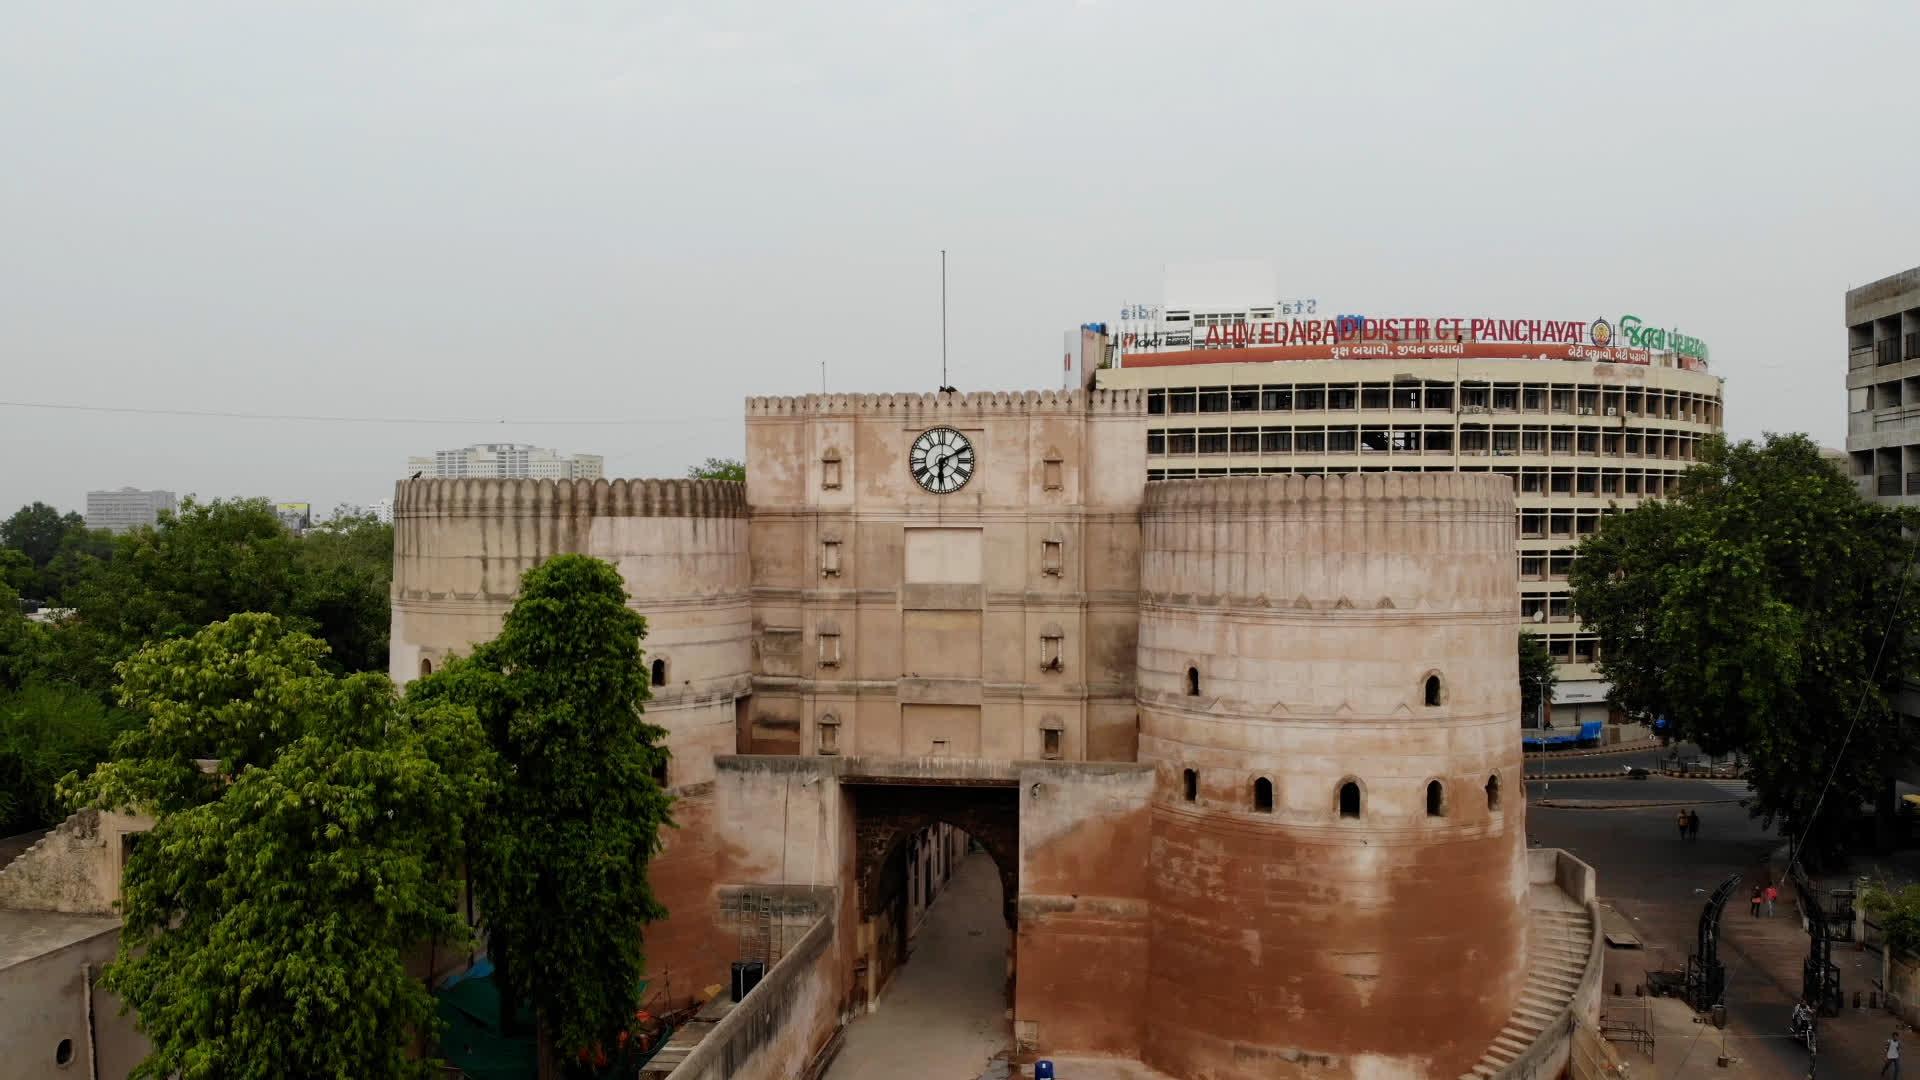 गुजरात के इतिहास का महत्वपूर्ण अध्याय: गुजरात सल्तनत